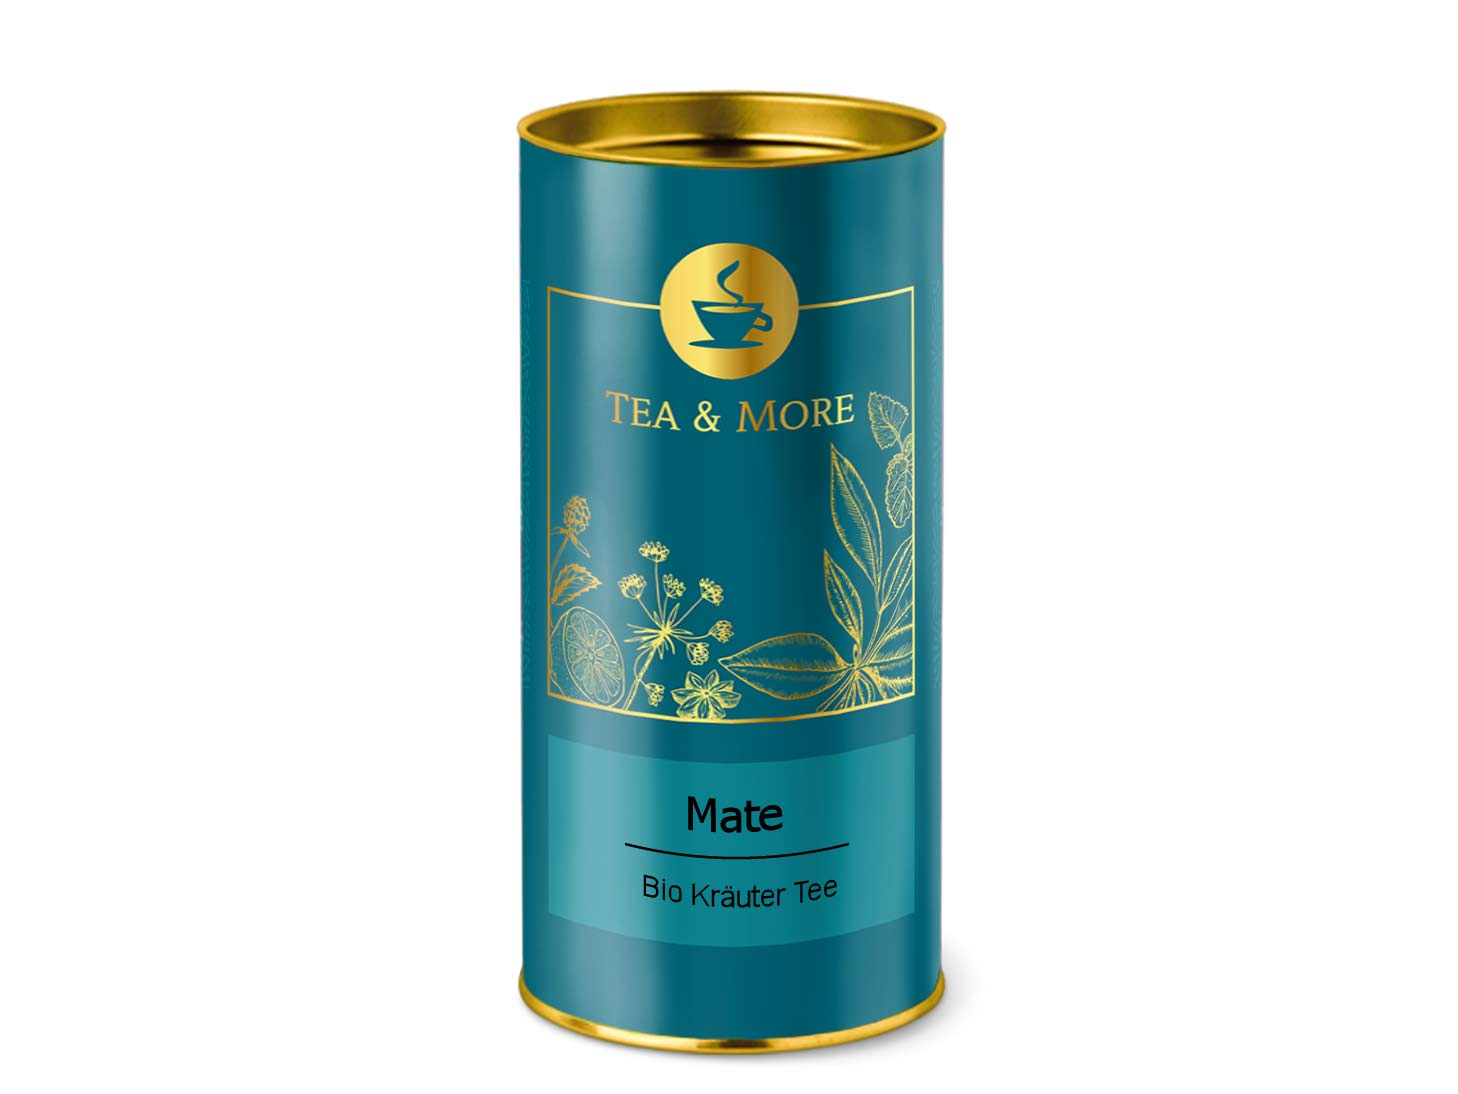 Mate Tee (Bio) - Ilex paraguensis